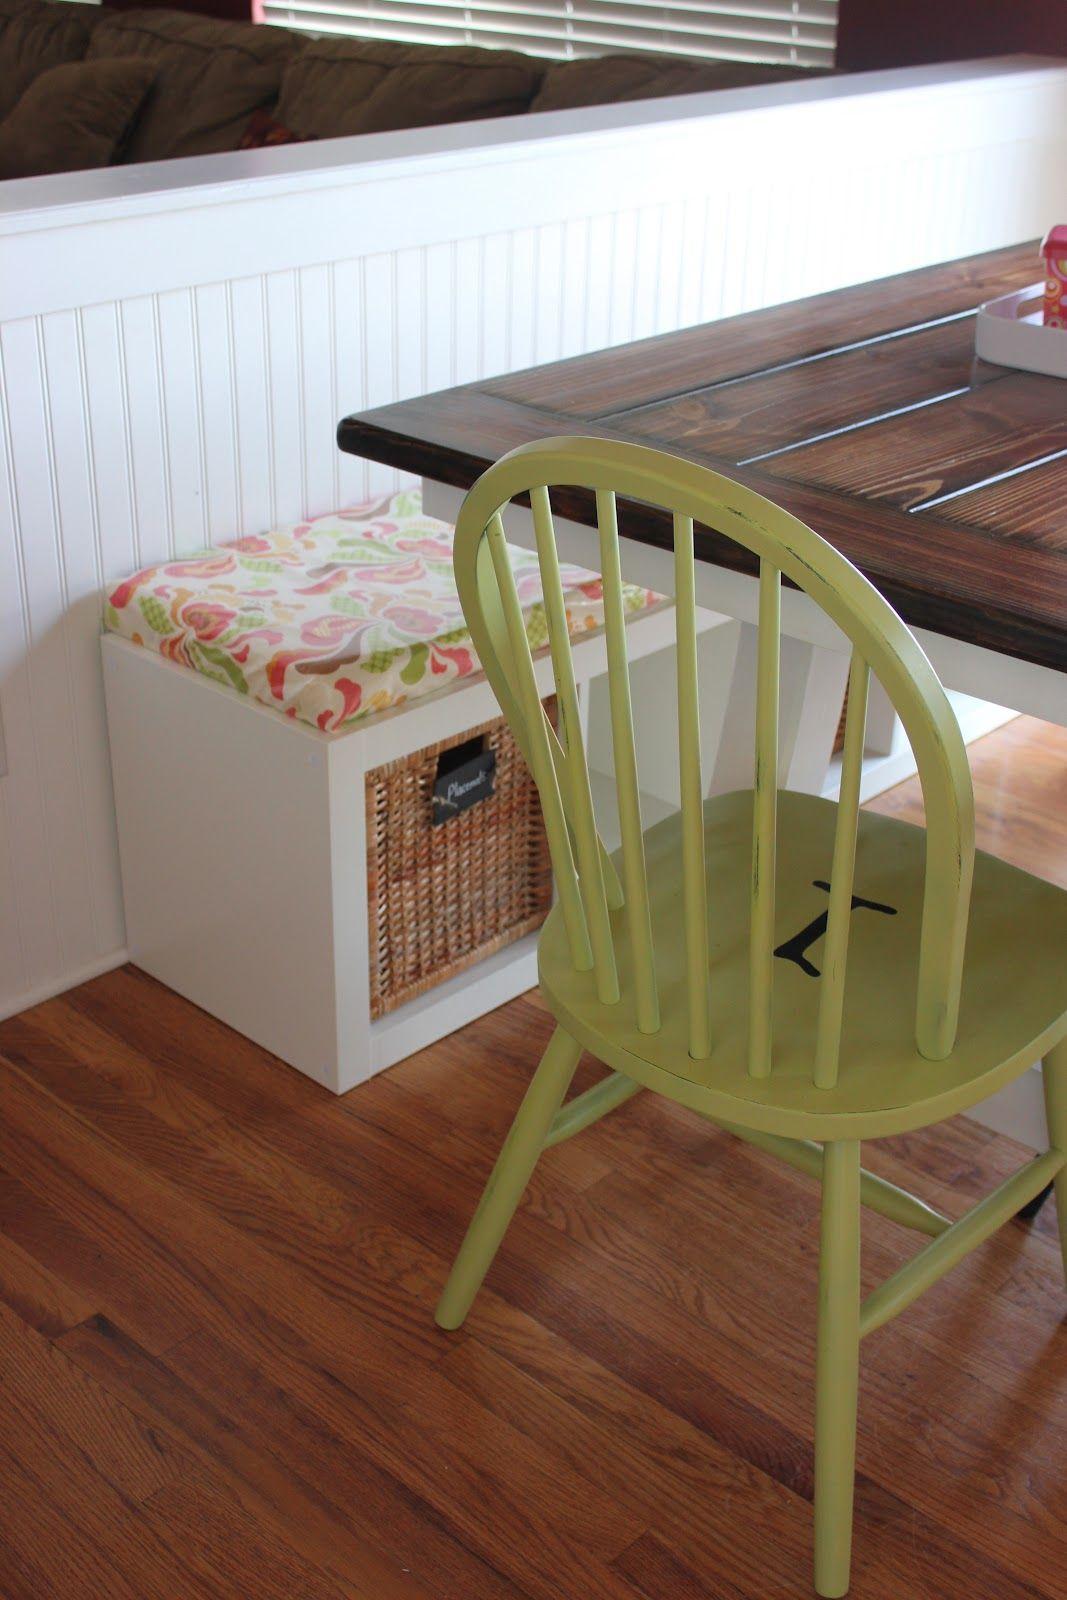 Kitchen Bench | Kitchen benches, Kitchen table bench, Ikea ...